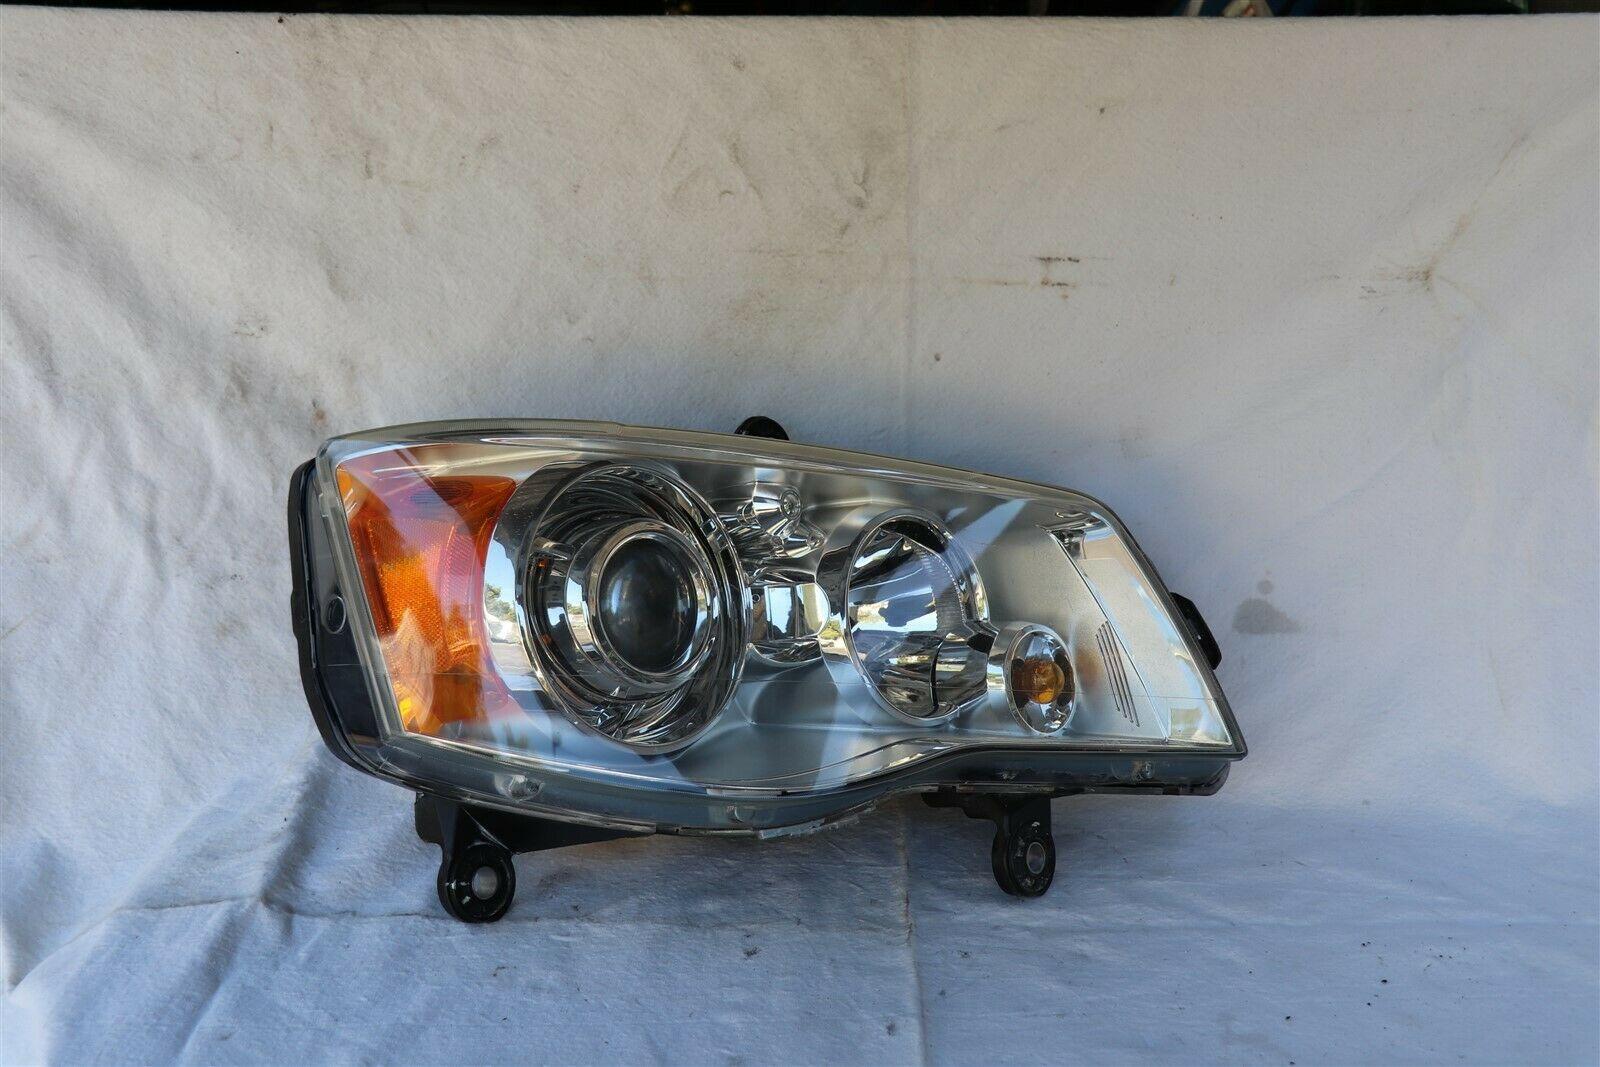 08-14 Chrysler Town & Country HID XENON Headlight Passenger Right RH